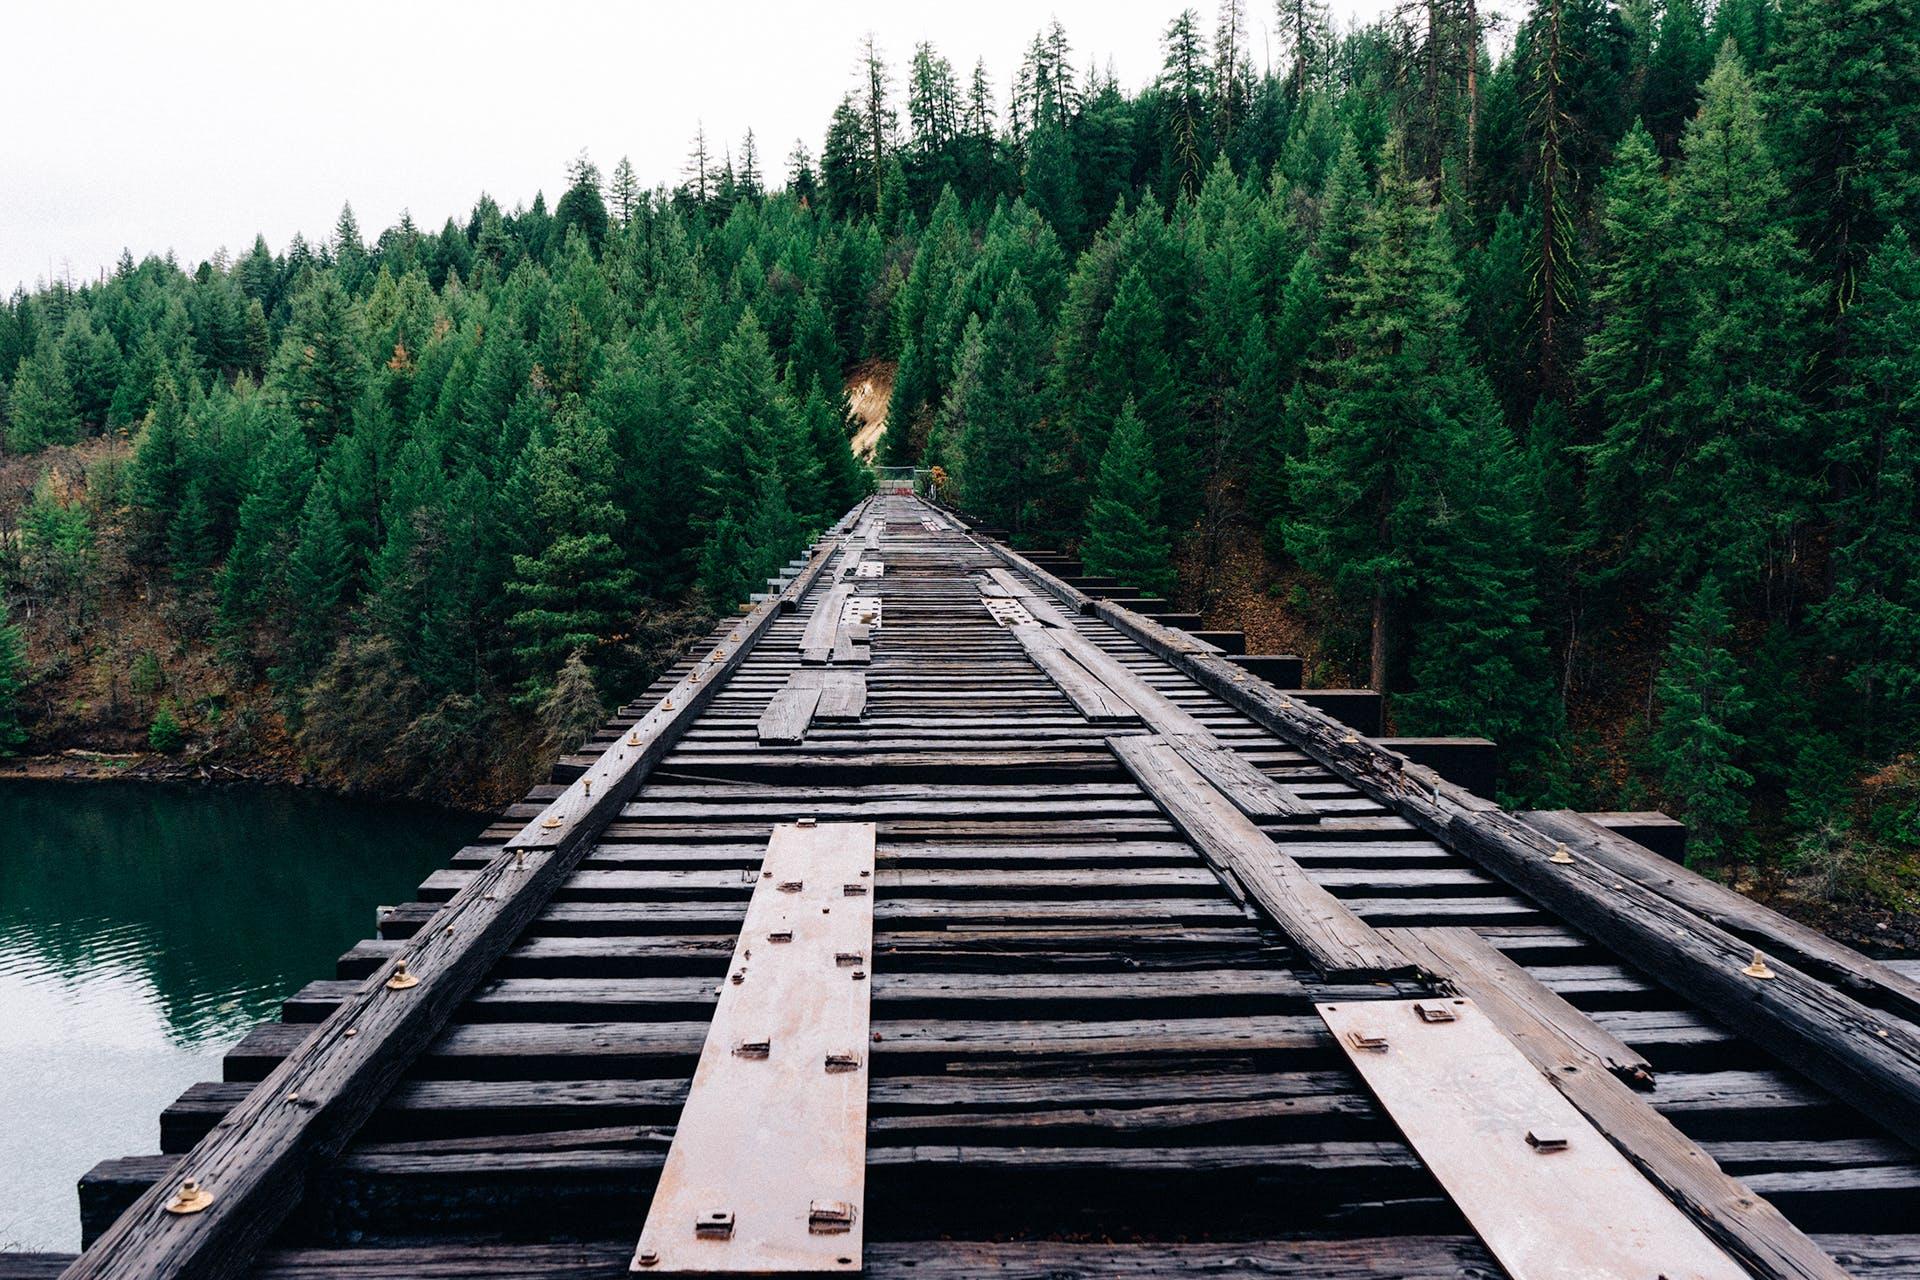 Free stock photo of forest, bridge, trees